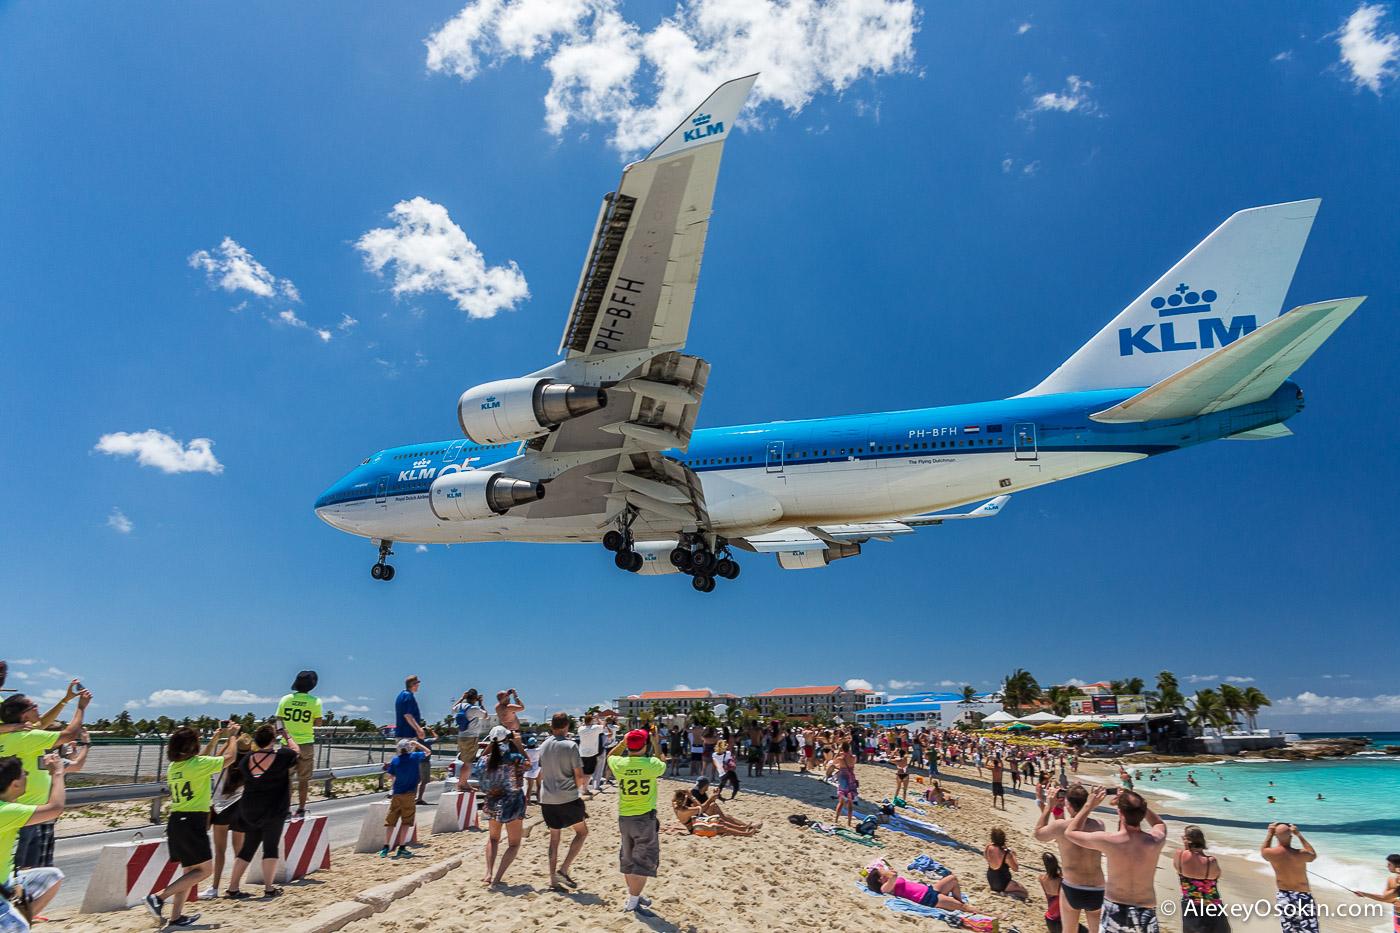 Цена билета на самолет для ребенка 6 лет